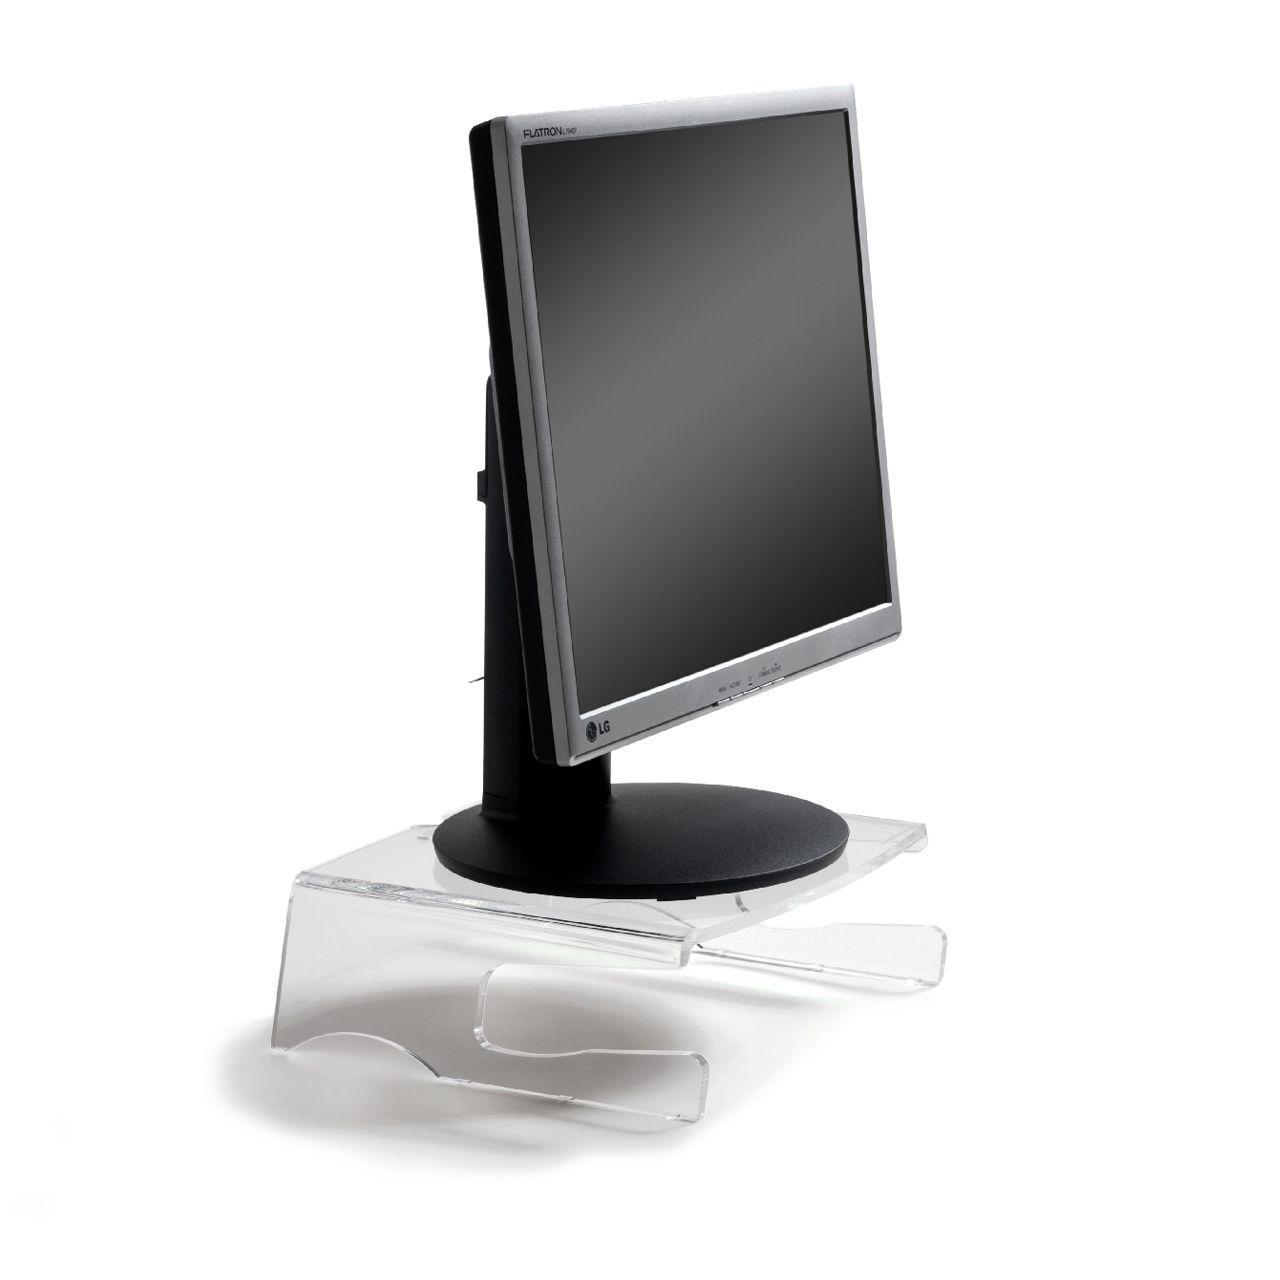 Q-riser-100-monitorsteun-erkaq1058_0000s_0000s_0000_met_monitor